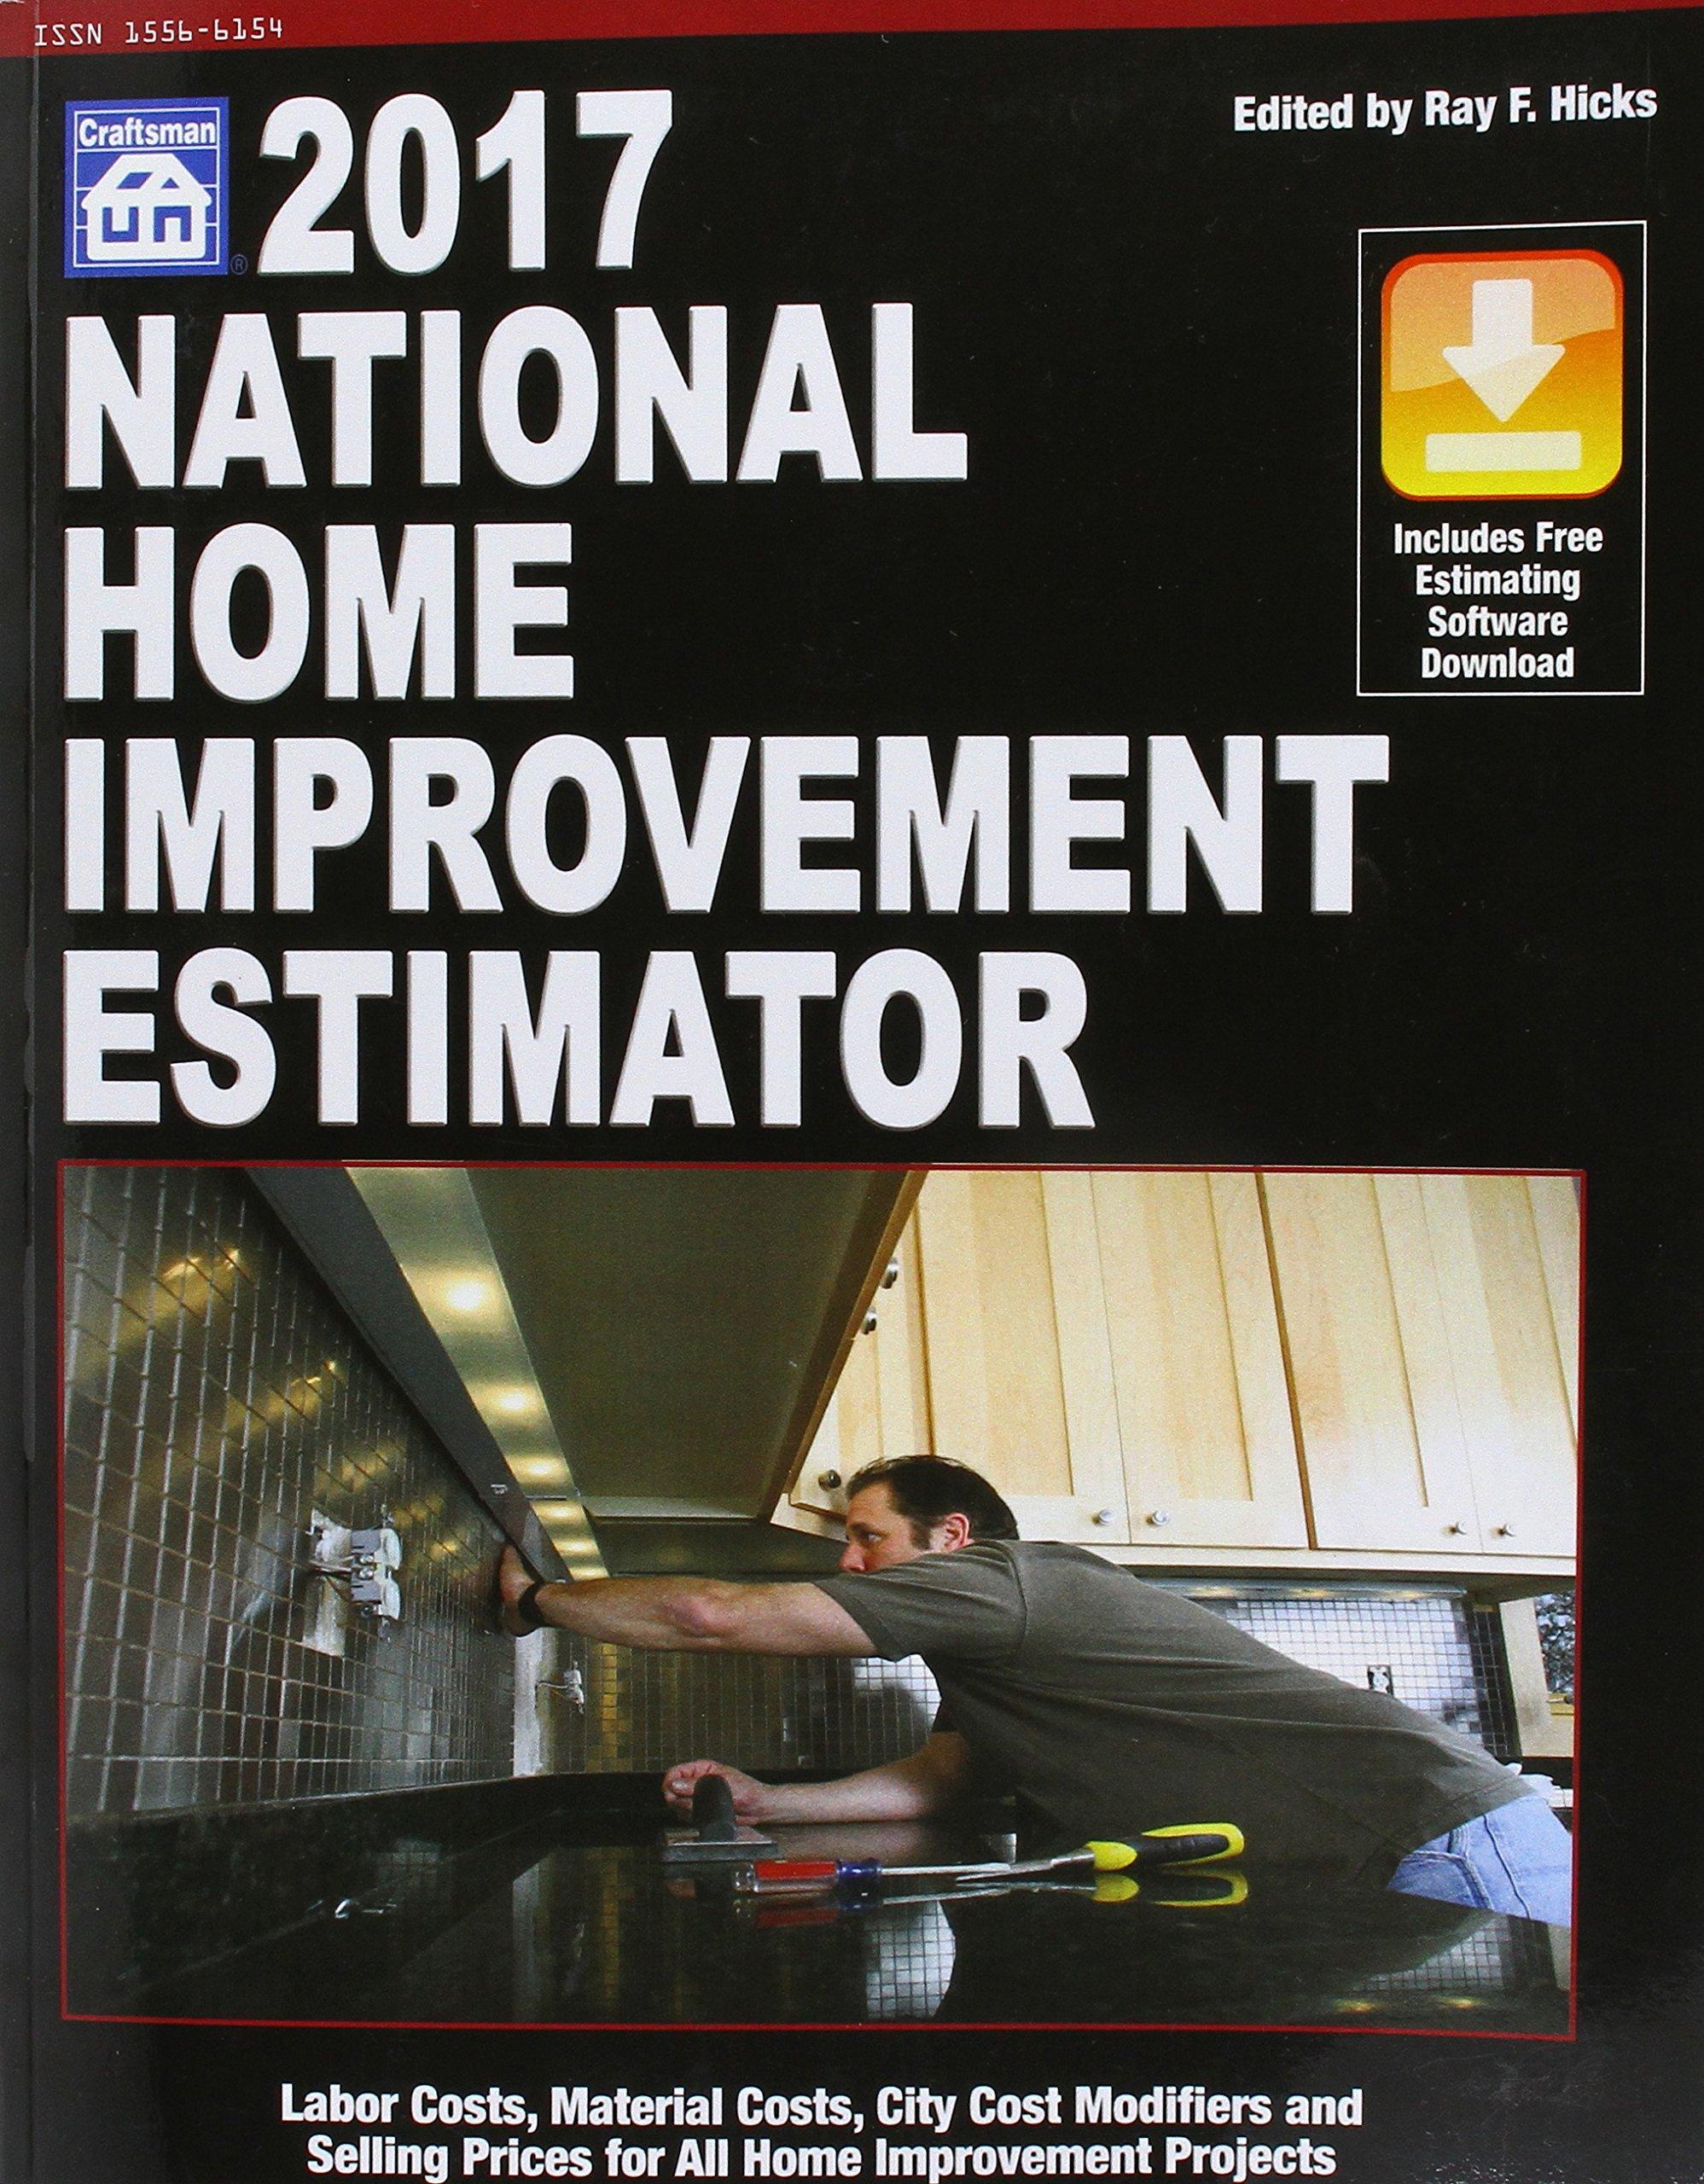 National Home Improvement Estimator 2017